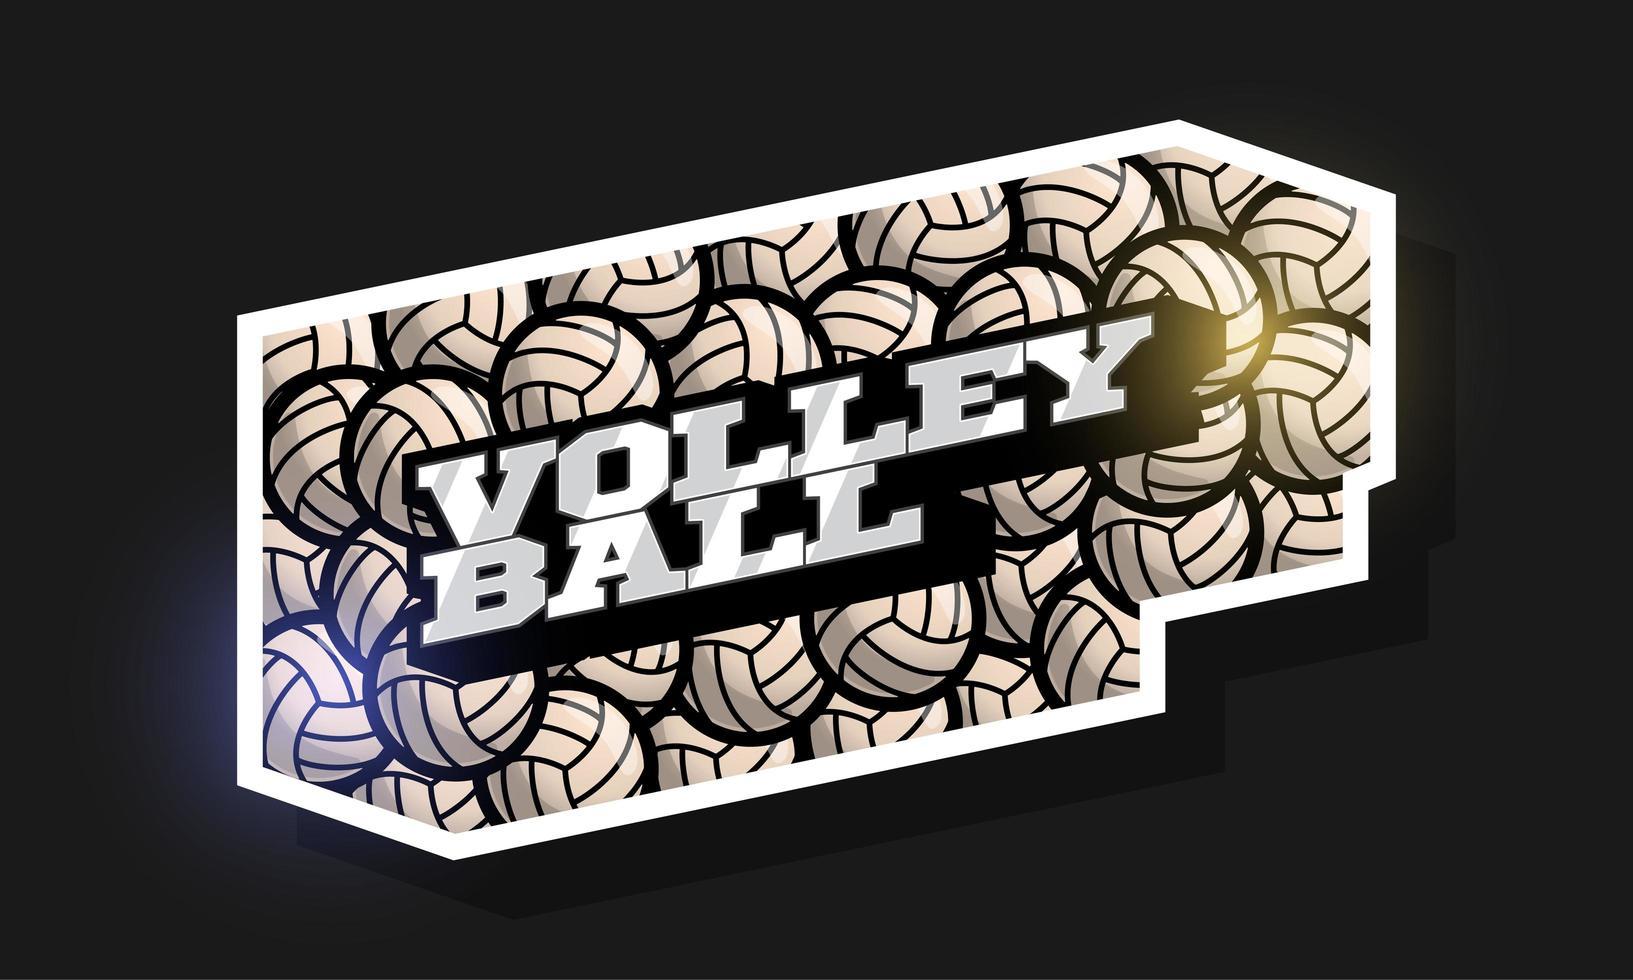 typographie professionnelle moderne volleyball sport style rétro vecteur